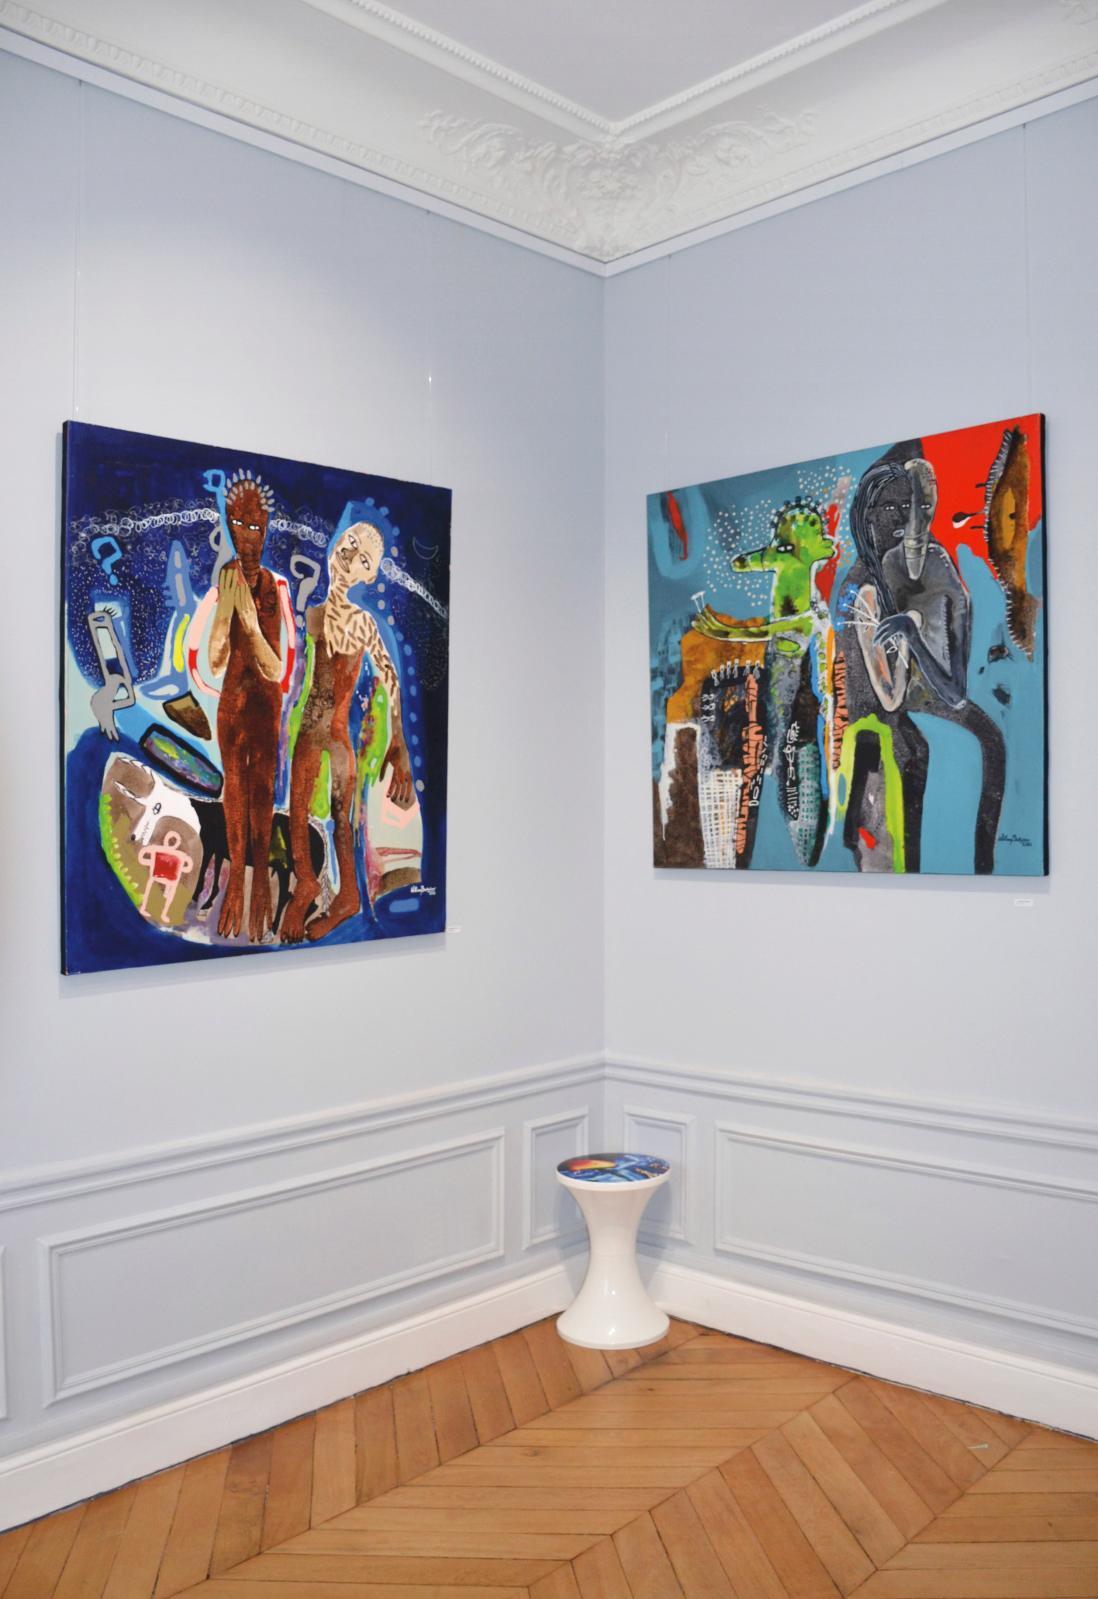 Œuvres de William Bakaïmo, exposition « Scène symphonique », 2021. © Renoma